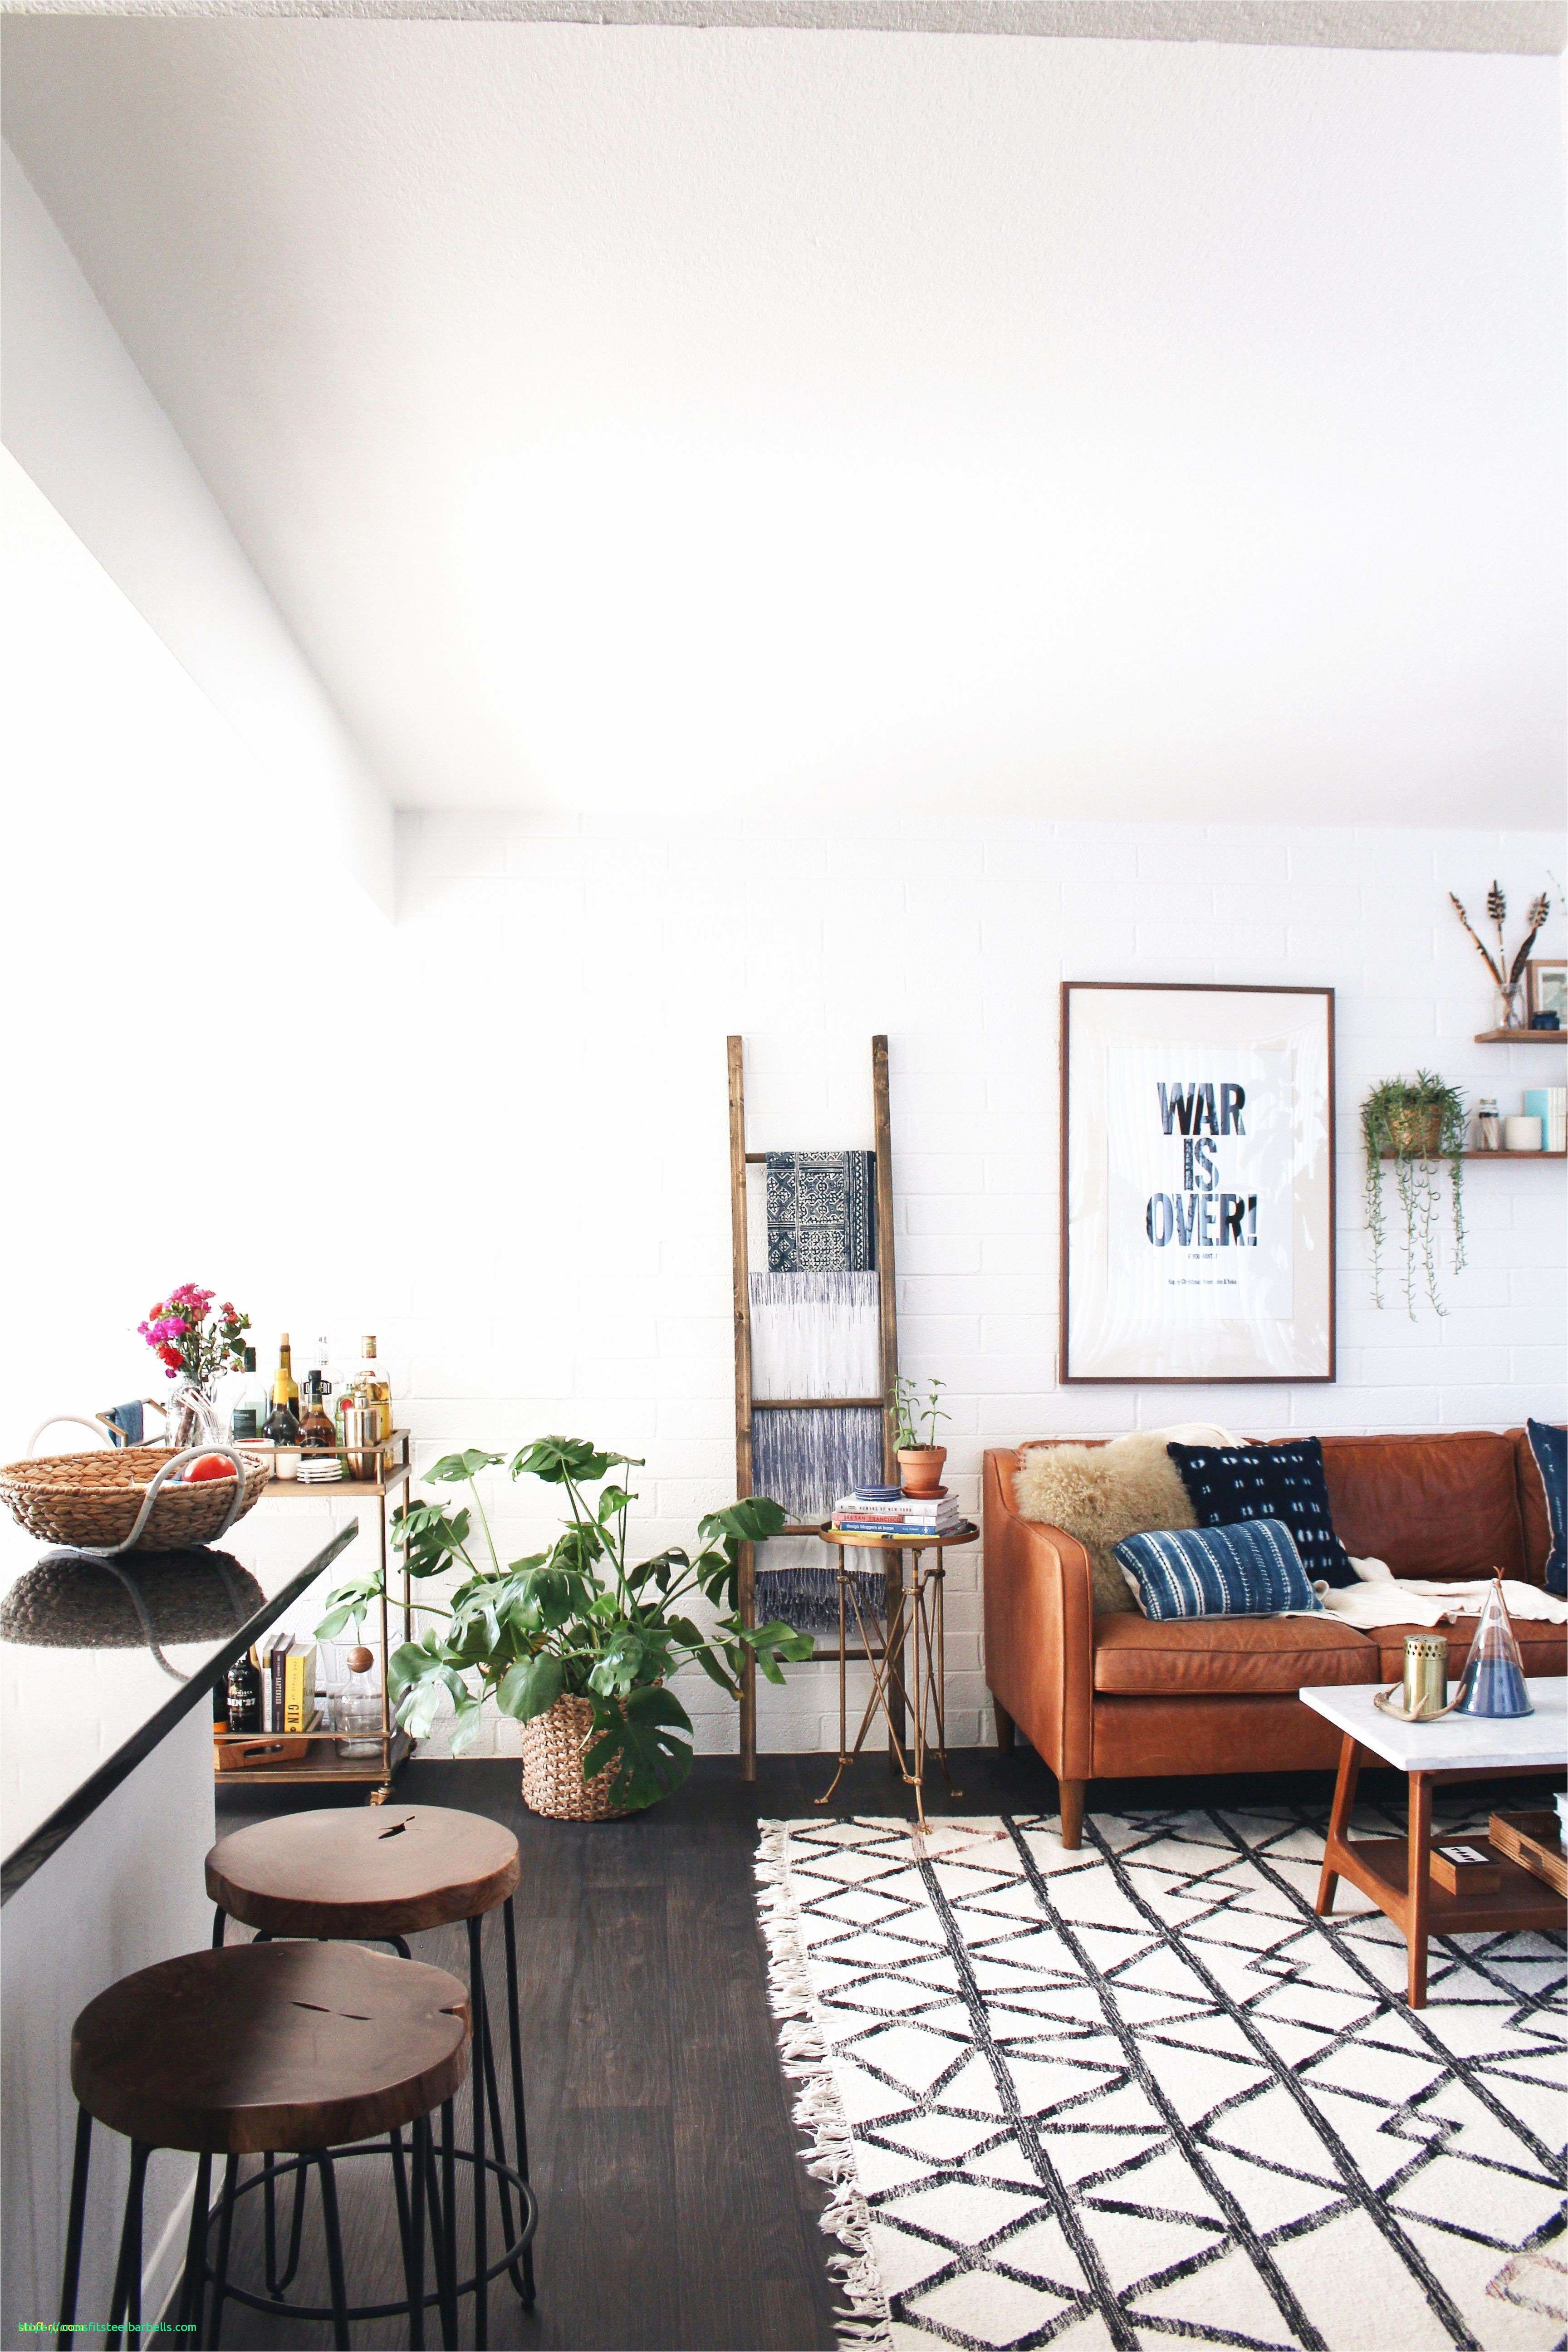 Furnished One Bedroom Apartments Tampa Fl Fresh Interior Decorators Venice  Fl Cross Fit Steel Barbells